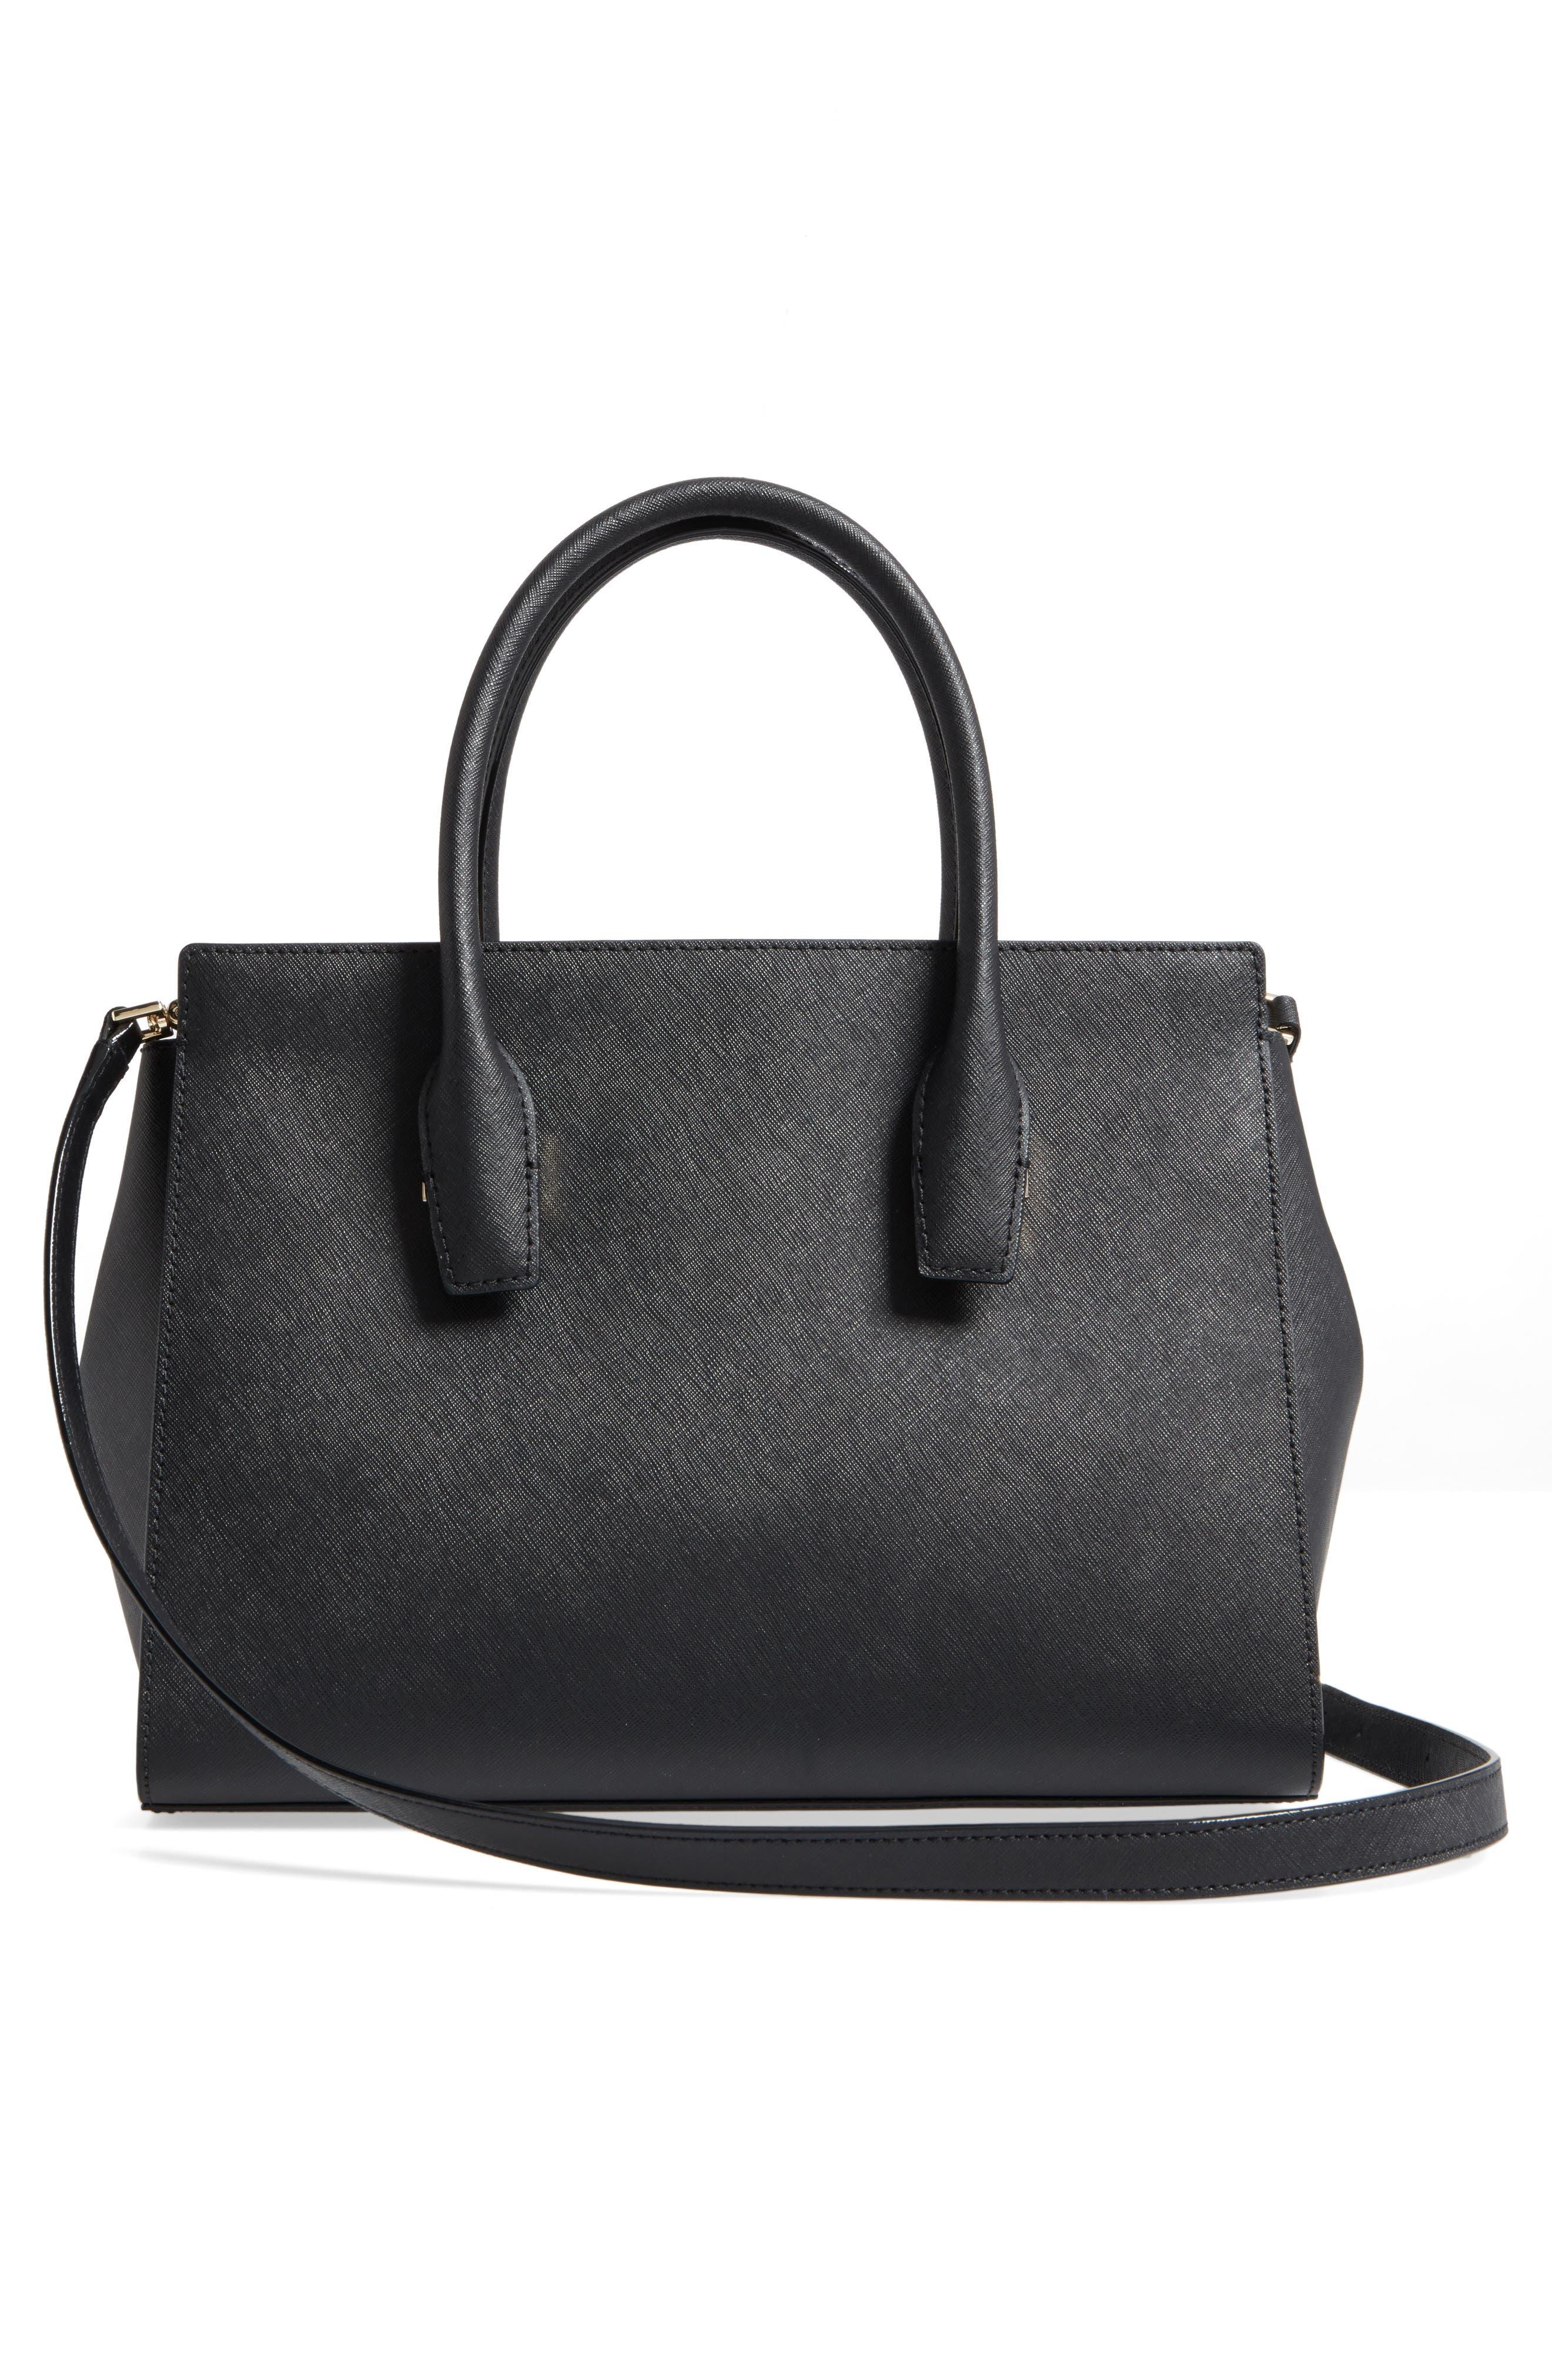 make it mine - candace leather satchel,                             Alternate thumbnail 5, color,